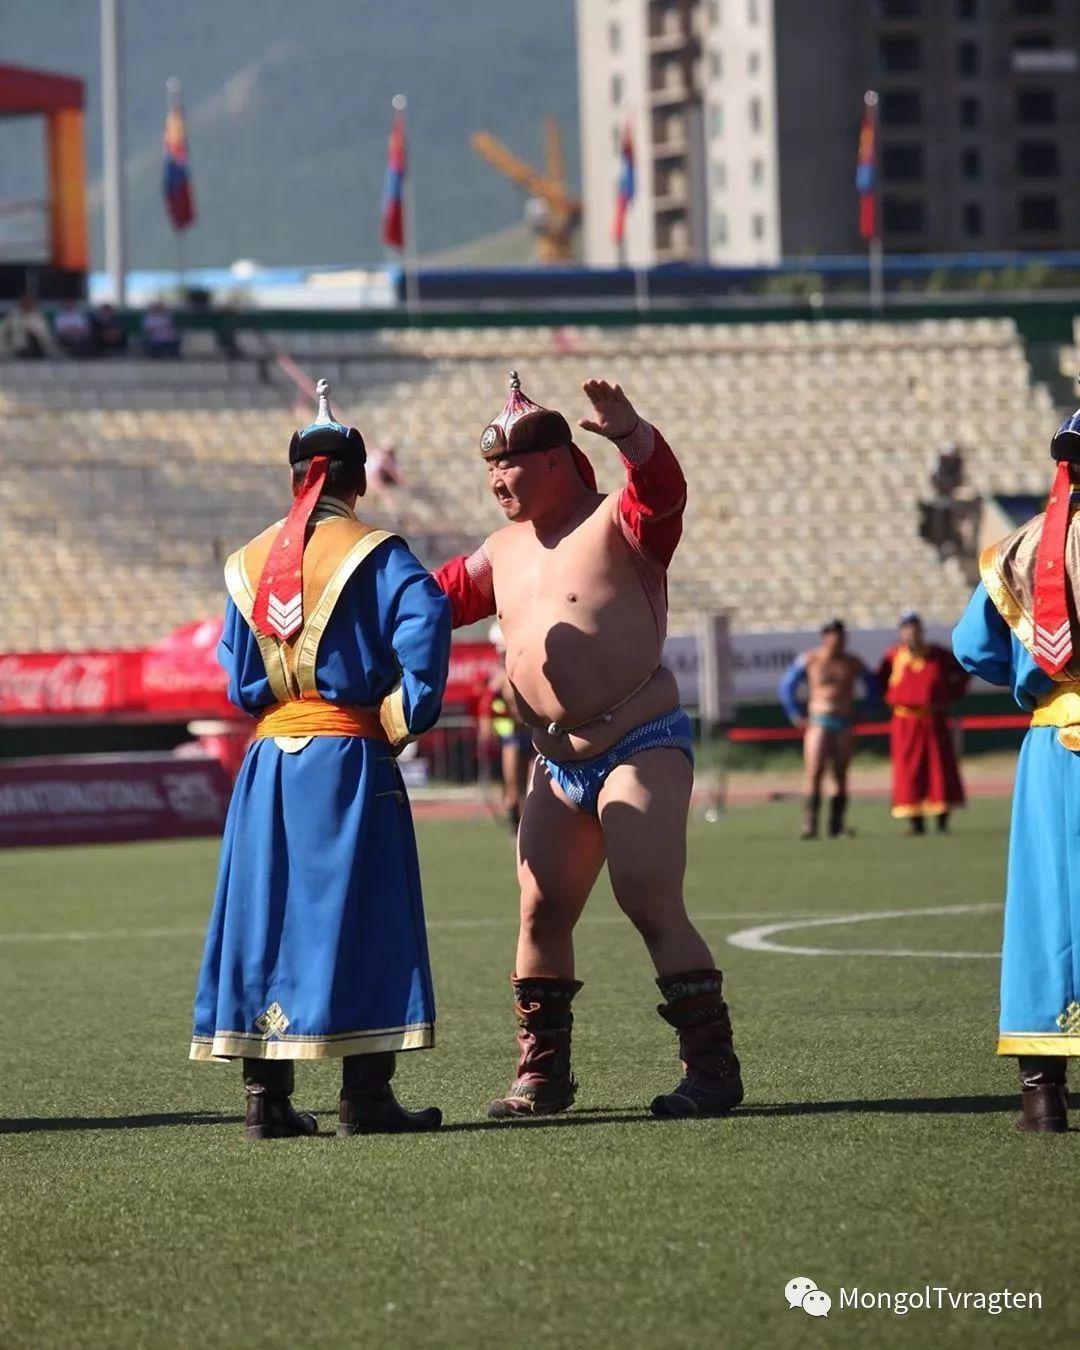 ᠮᠣᠩᠭᠣᠯ ᠨᠠᠭᠠᠳᠣᠮ 那达慕 第79张 ᠮᠣᠩᠭᠣᠯ ᠨᠠᠭᠠᠳᠣᠮ 那达慕 蒙古文化